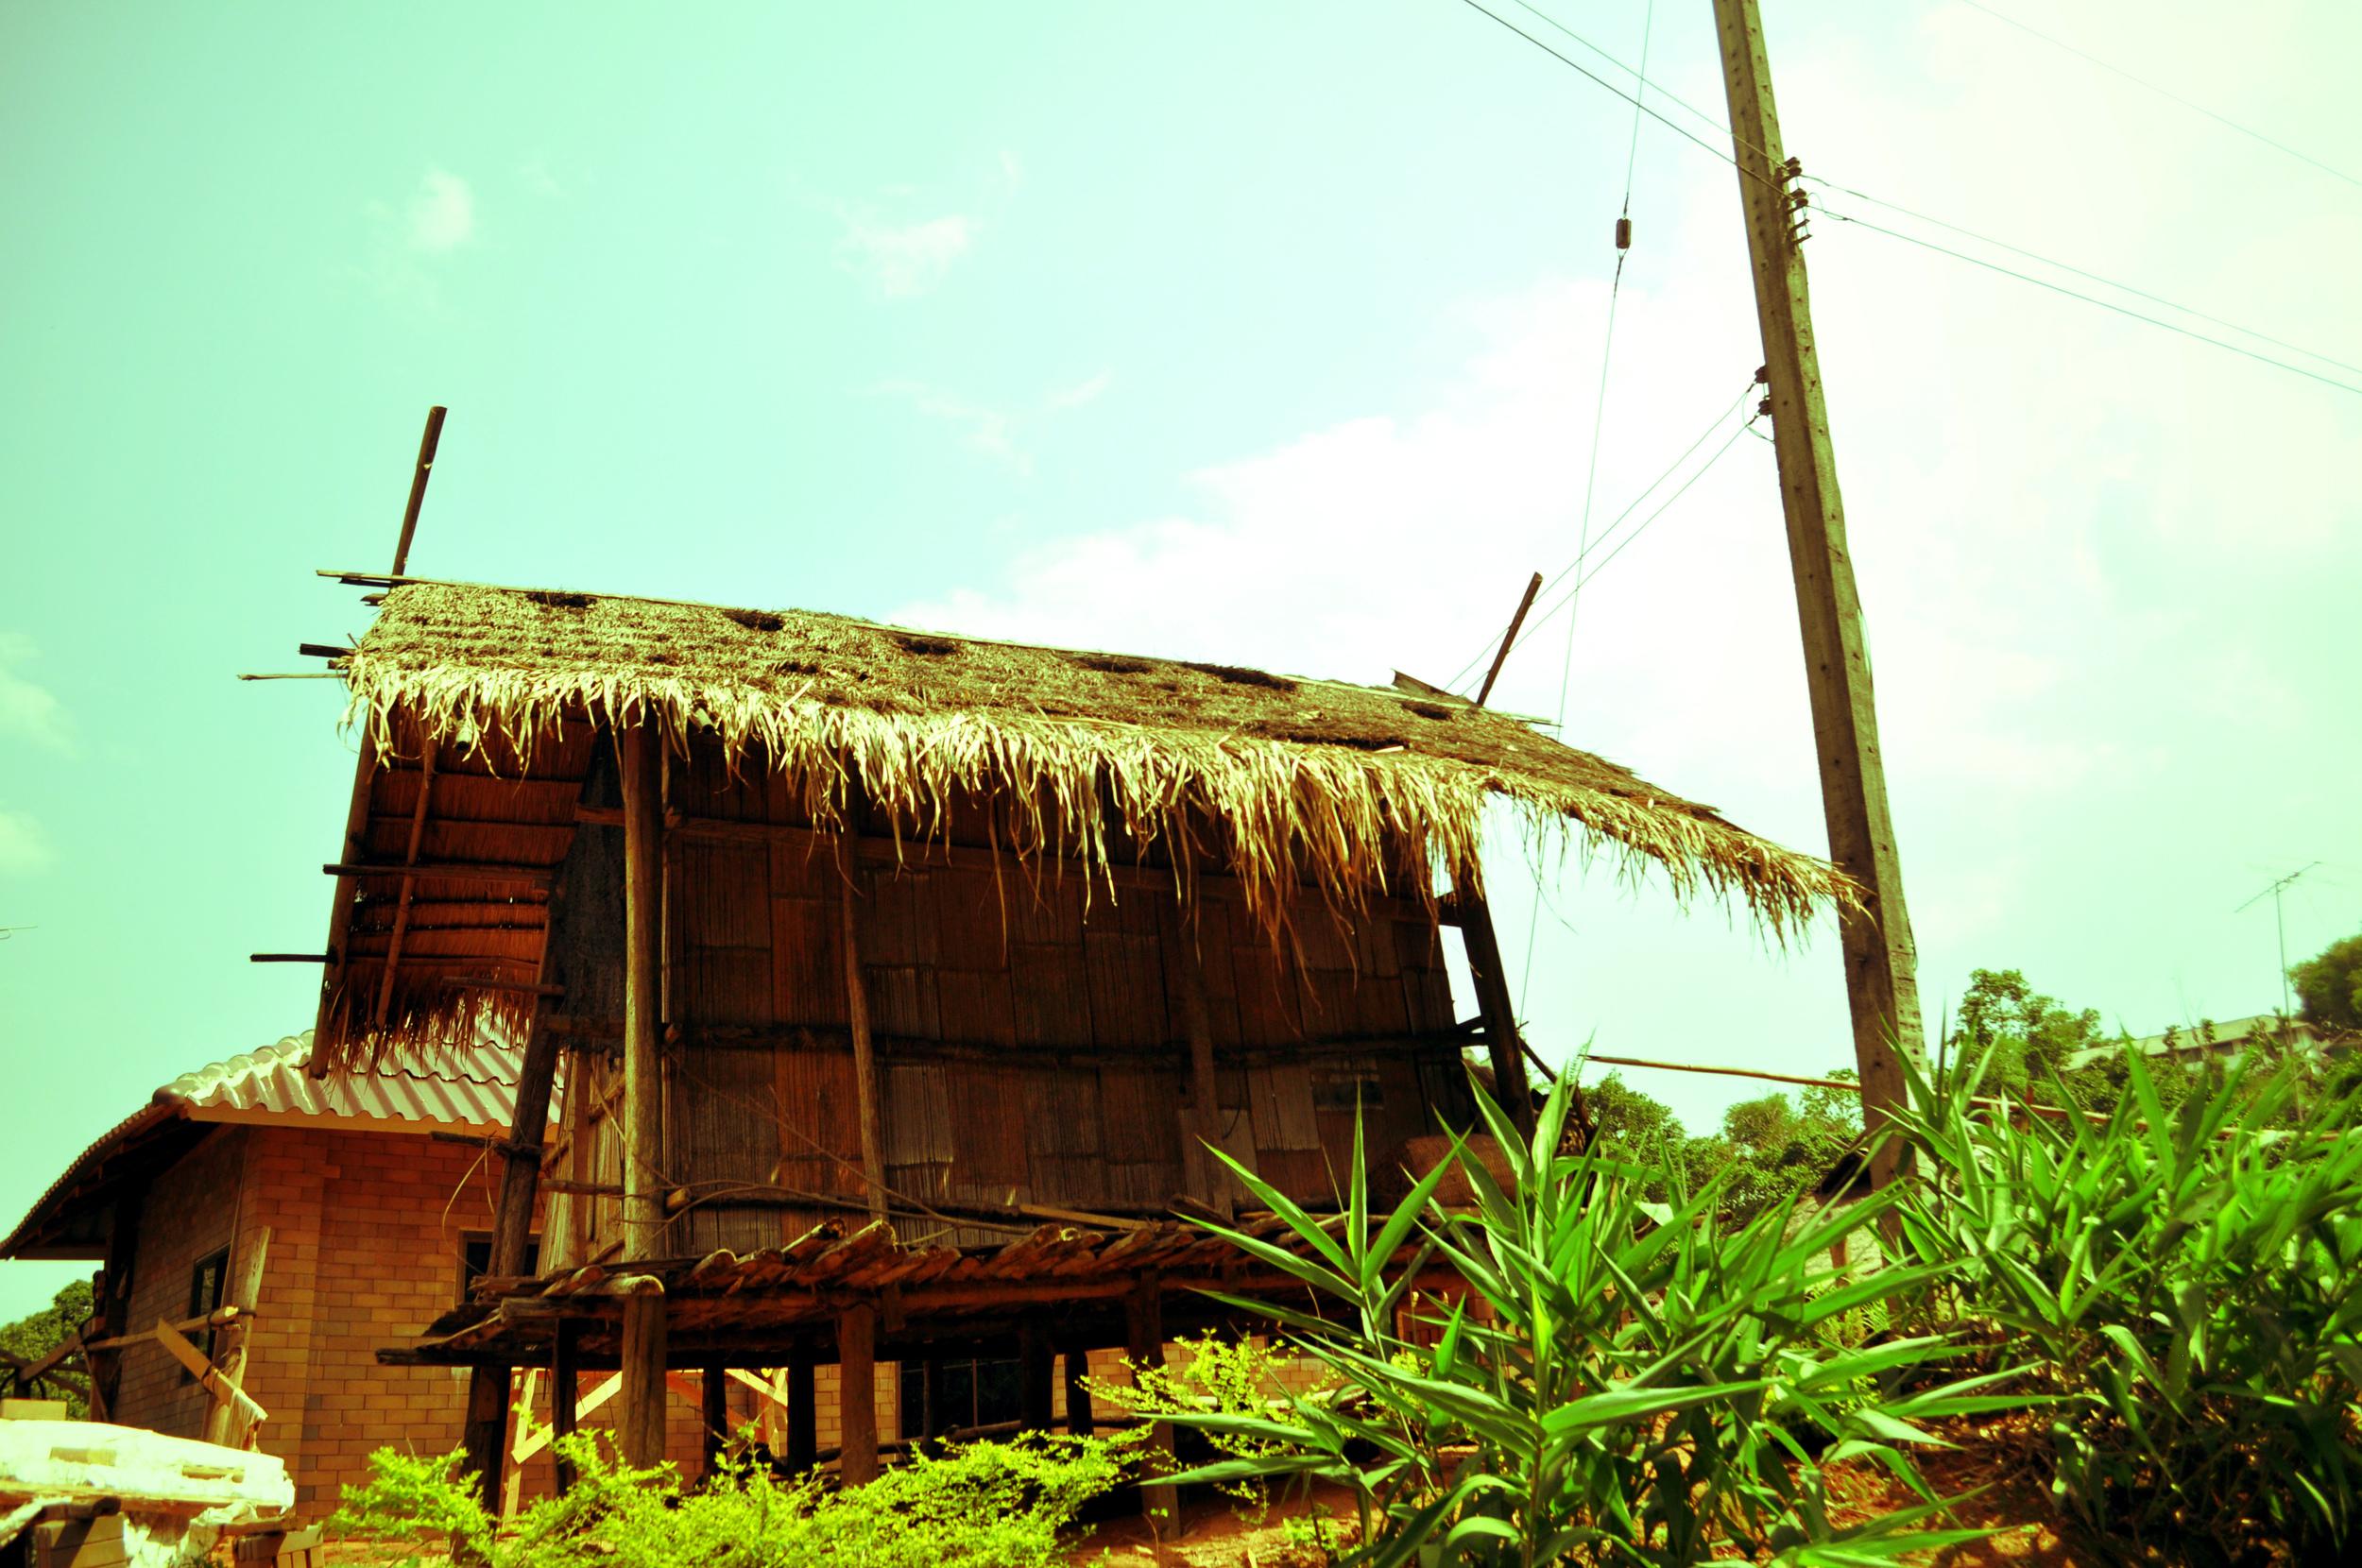 Harvest hut